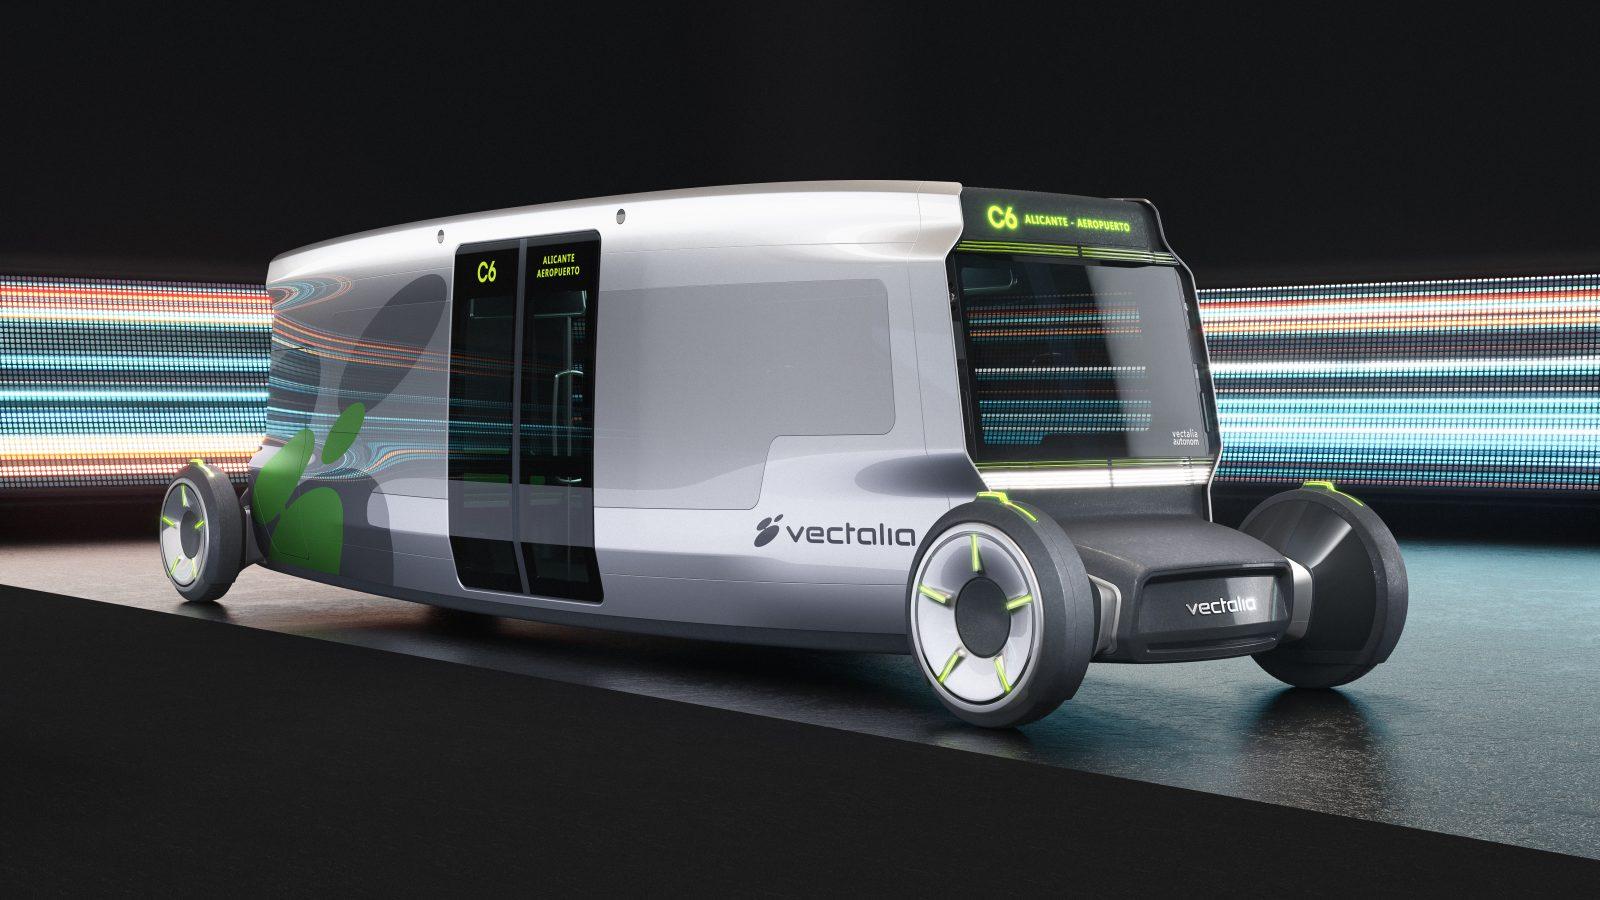 Vectalia Streat Bus™